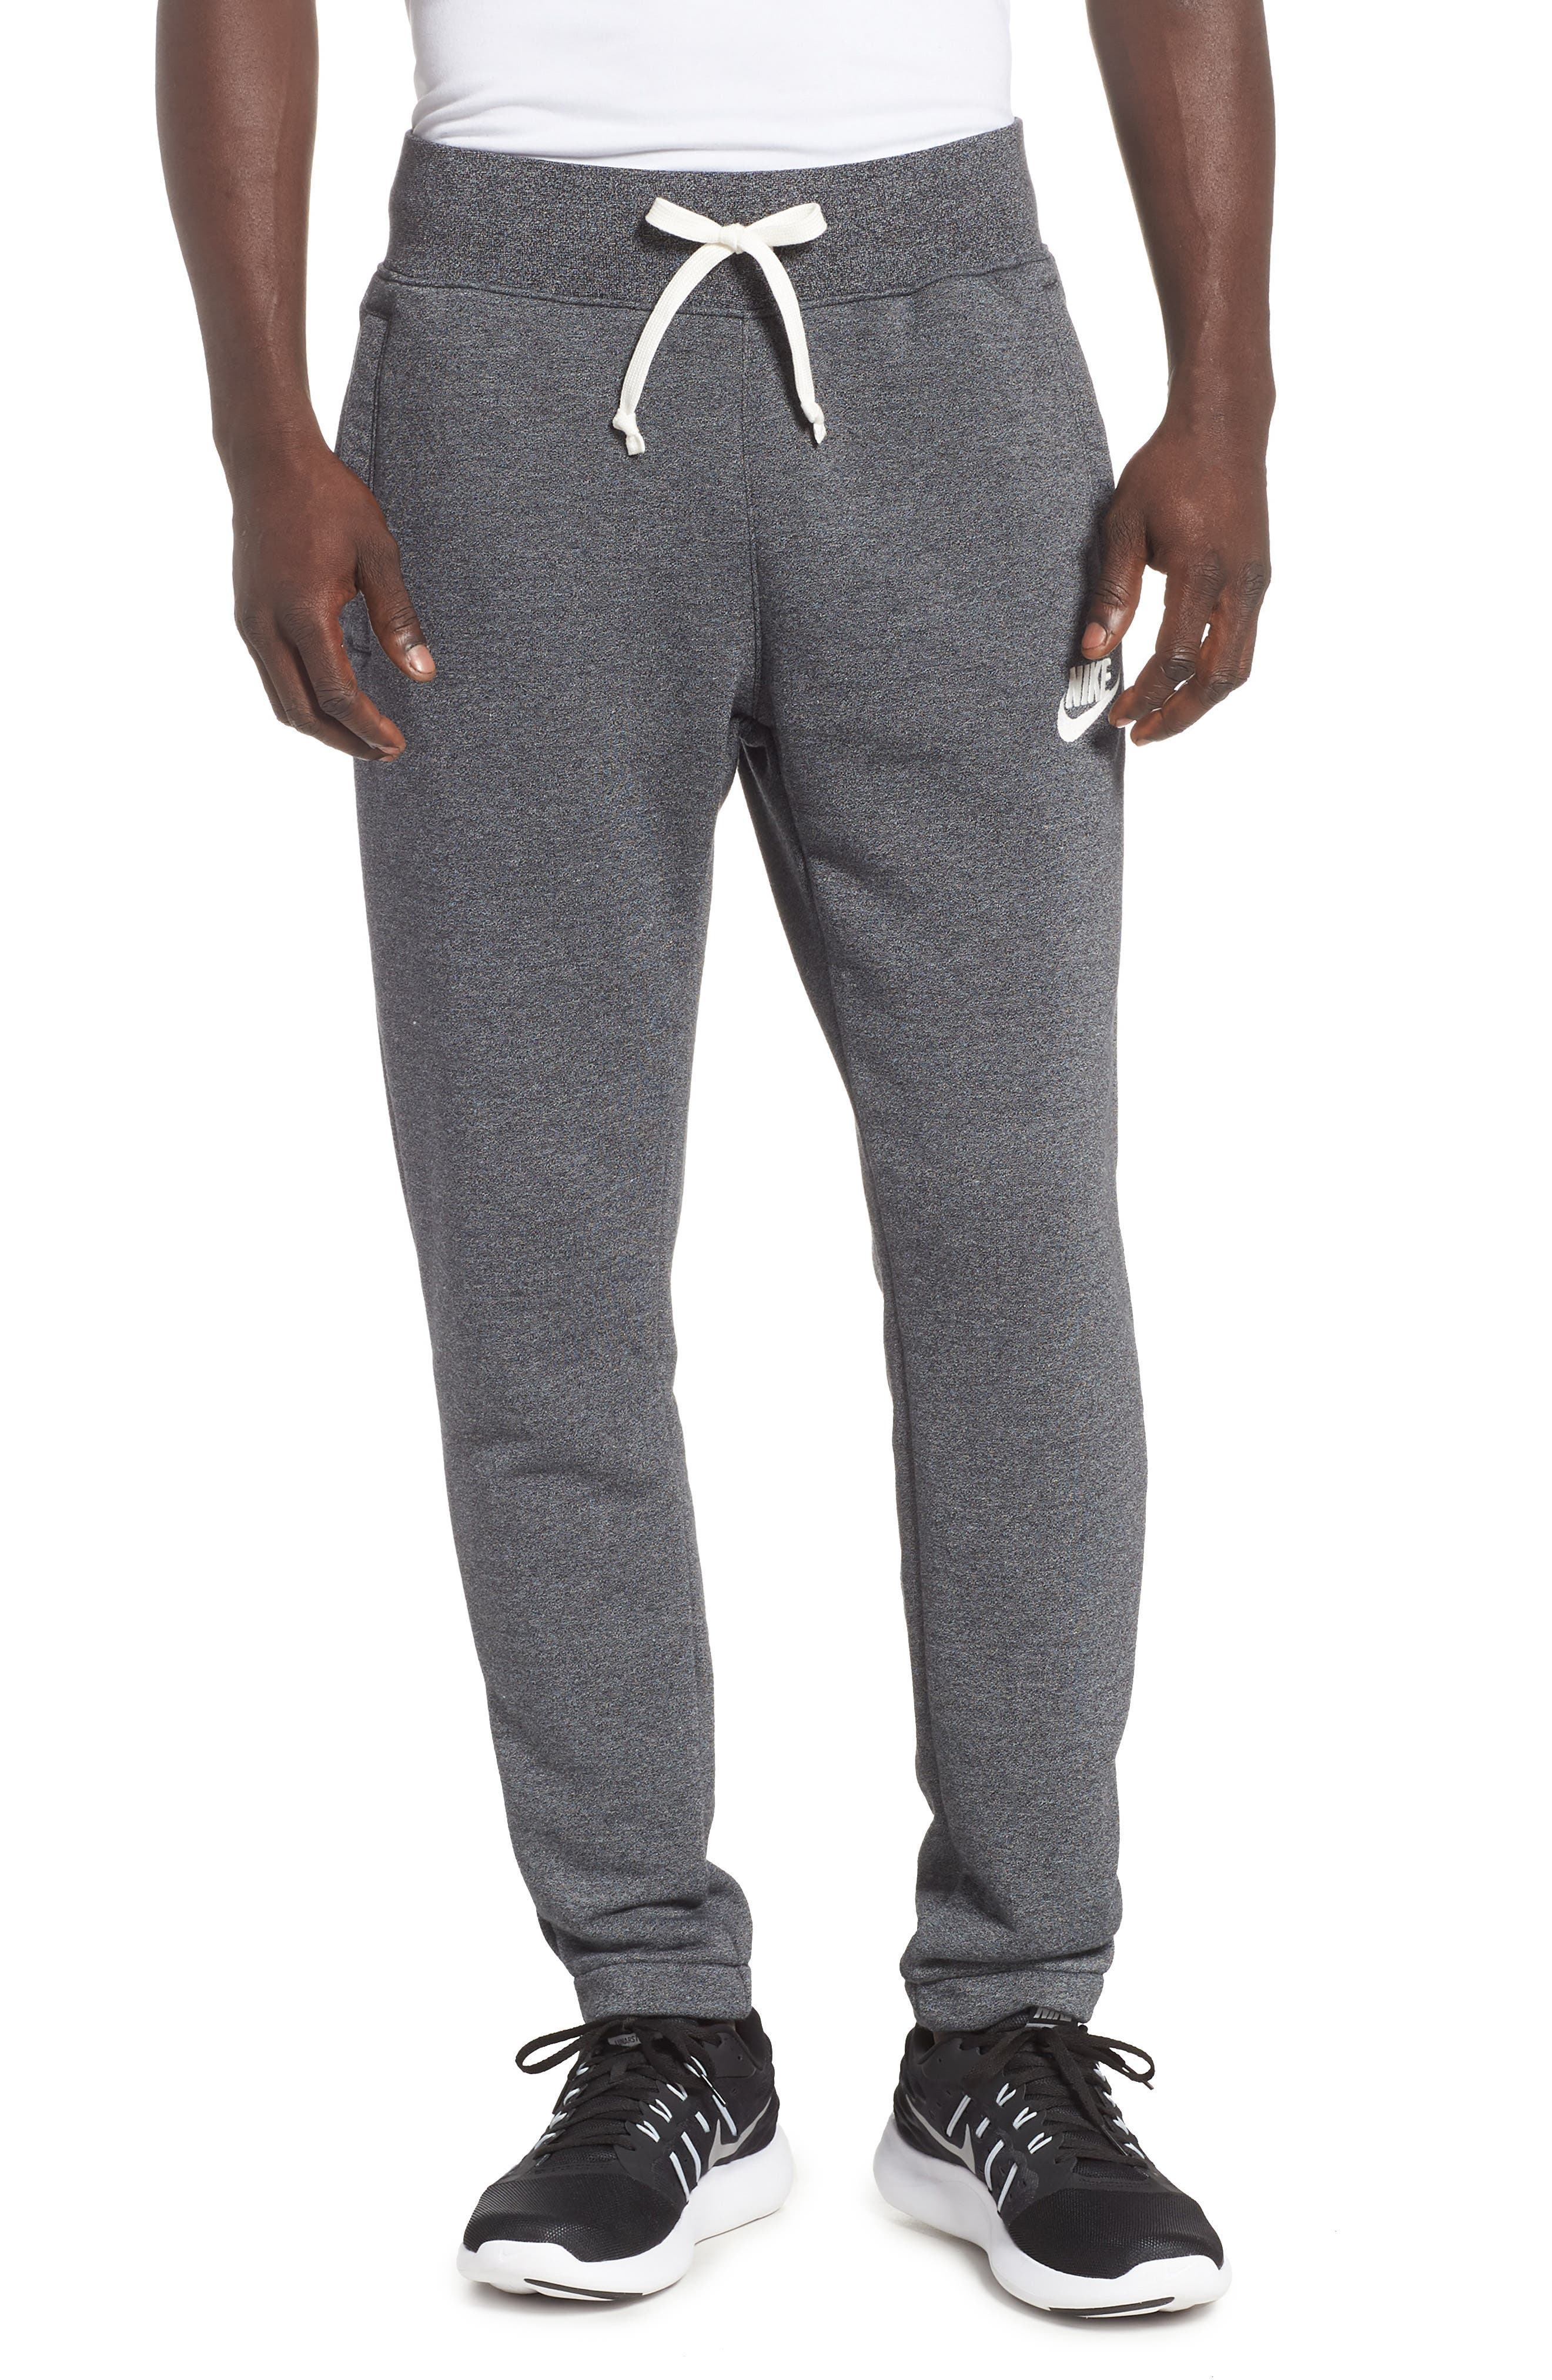 Sportswear ACG Heritage Pants,                             Main thumbnail 1, color,                             BLACK/ HTR/ SAIL